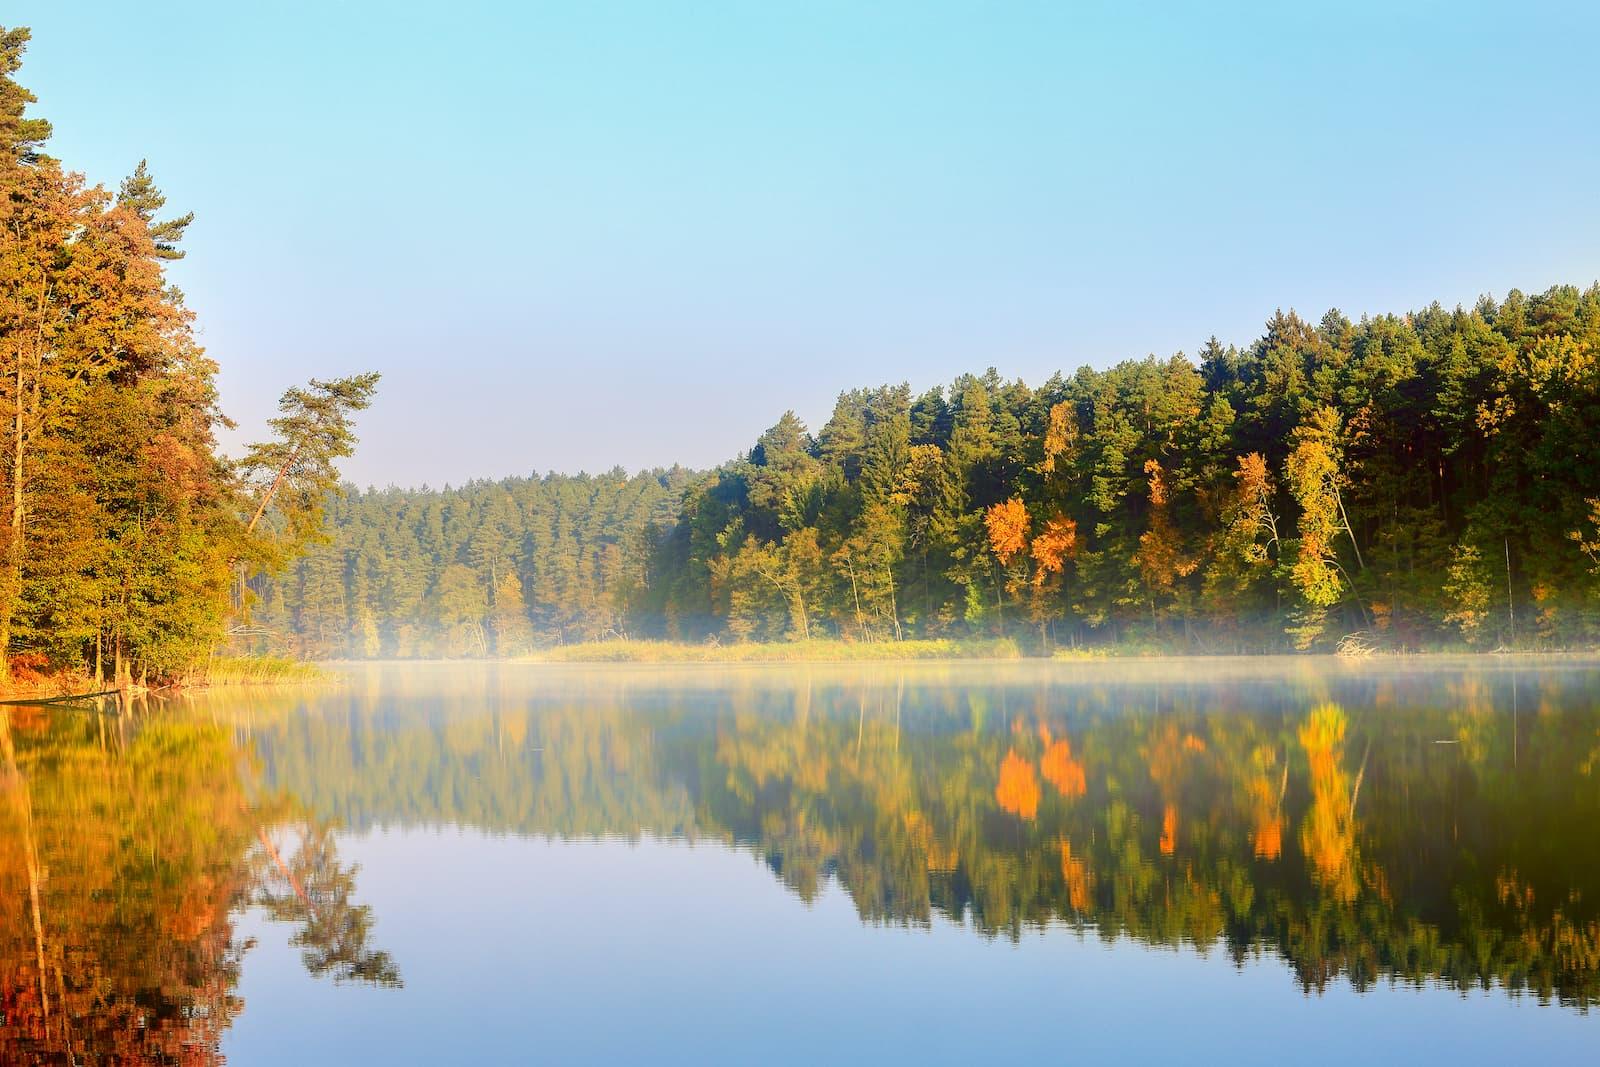 jezioro pluszne